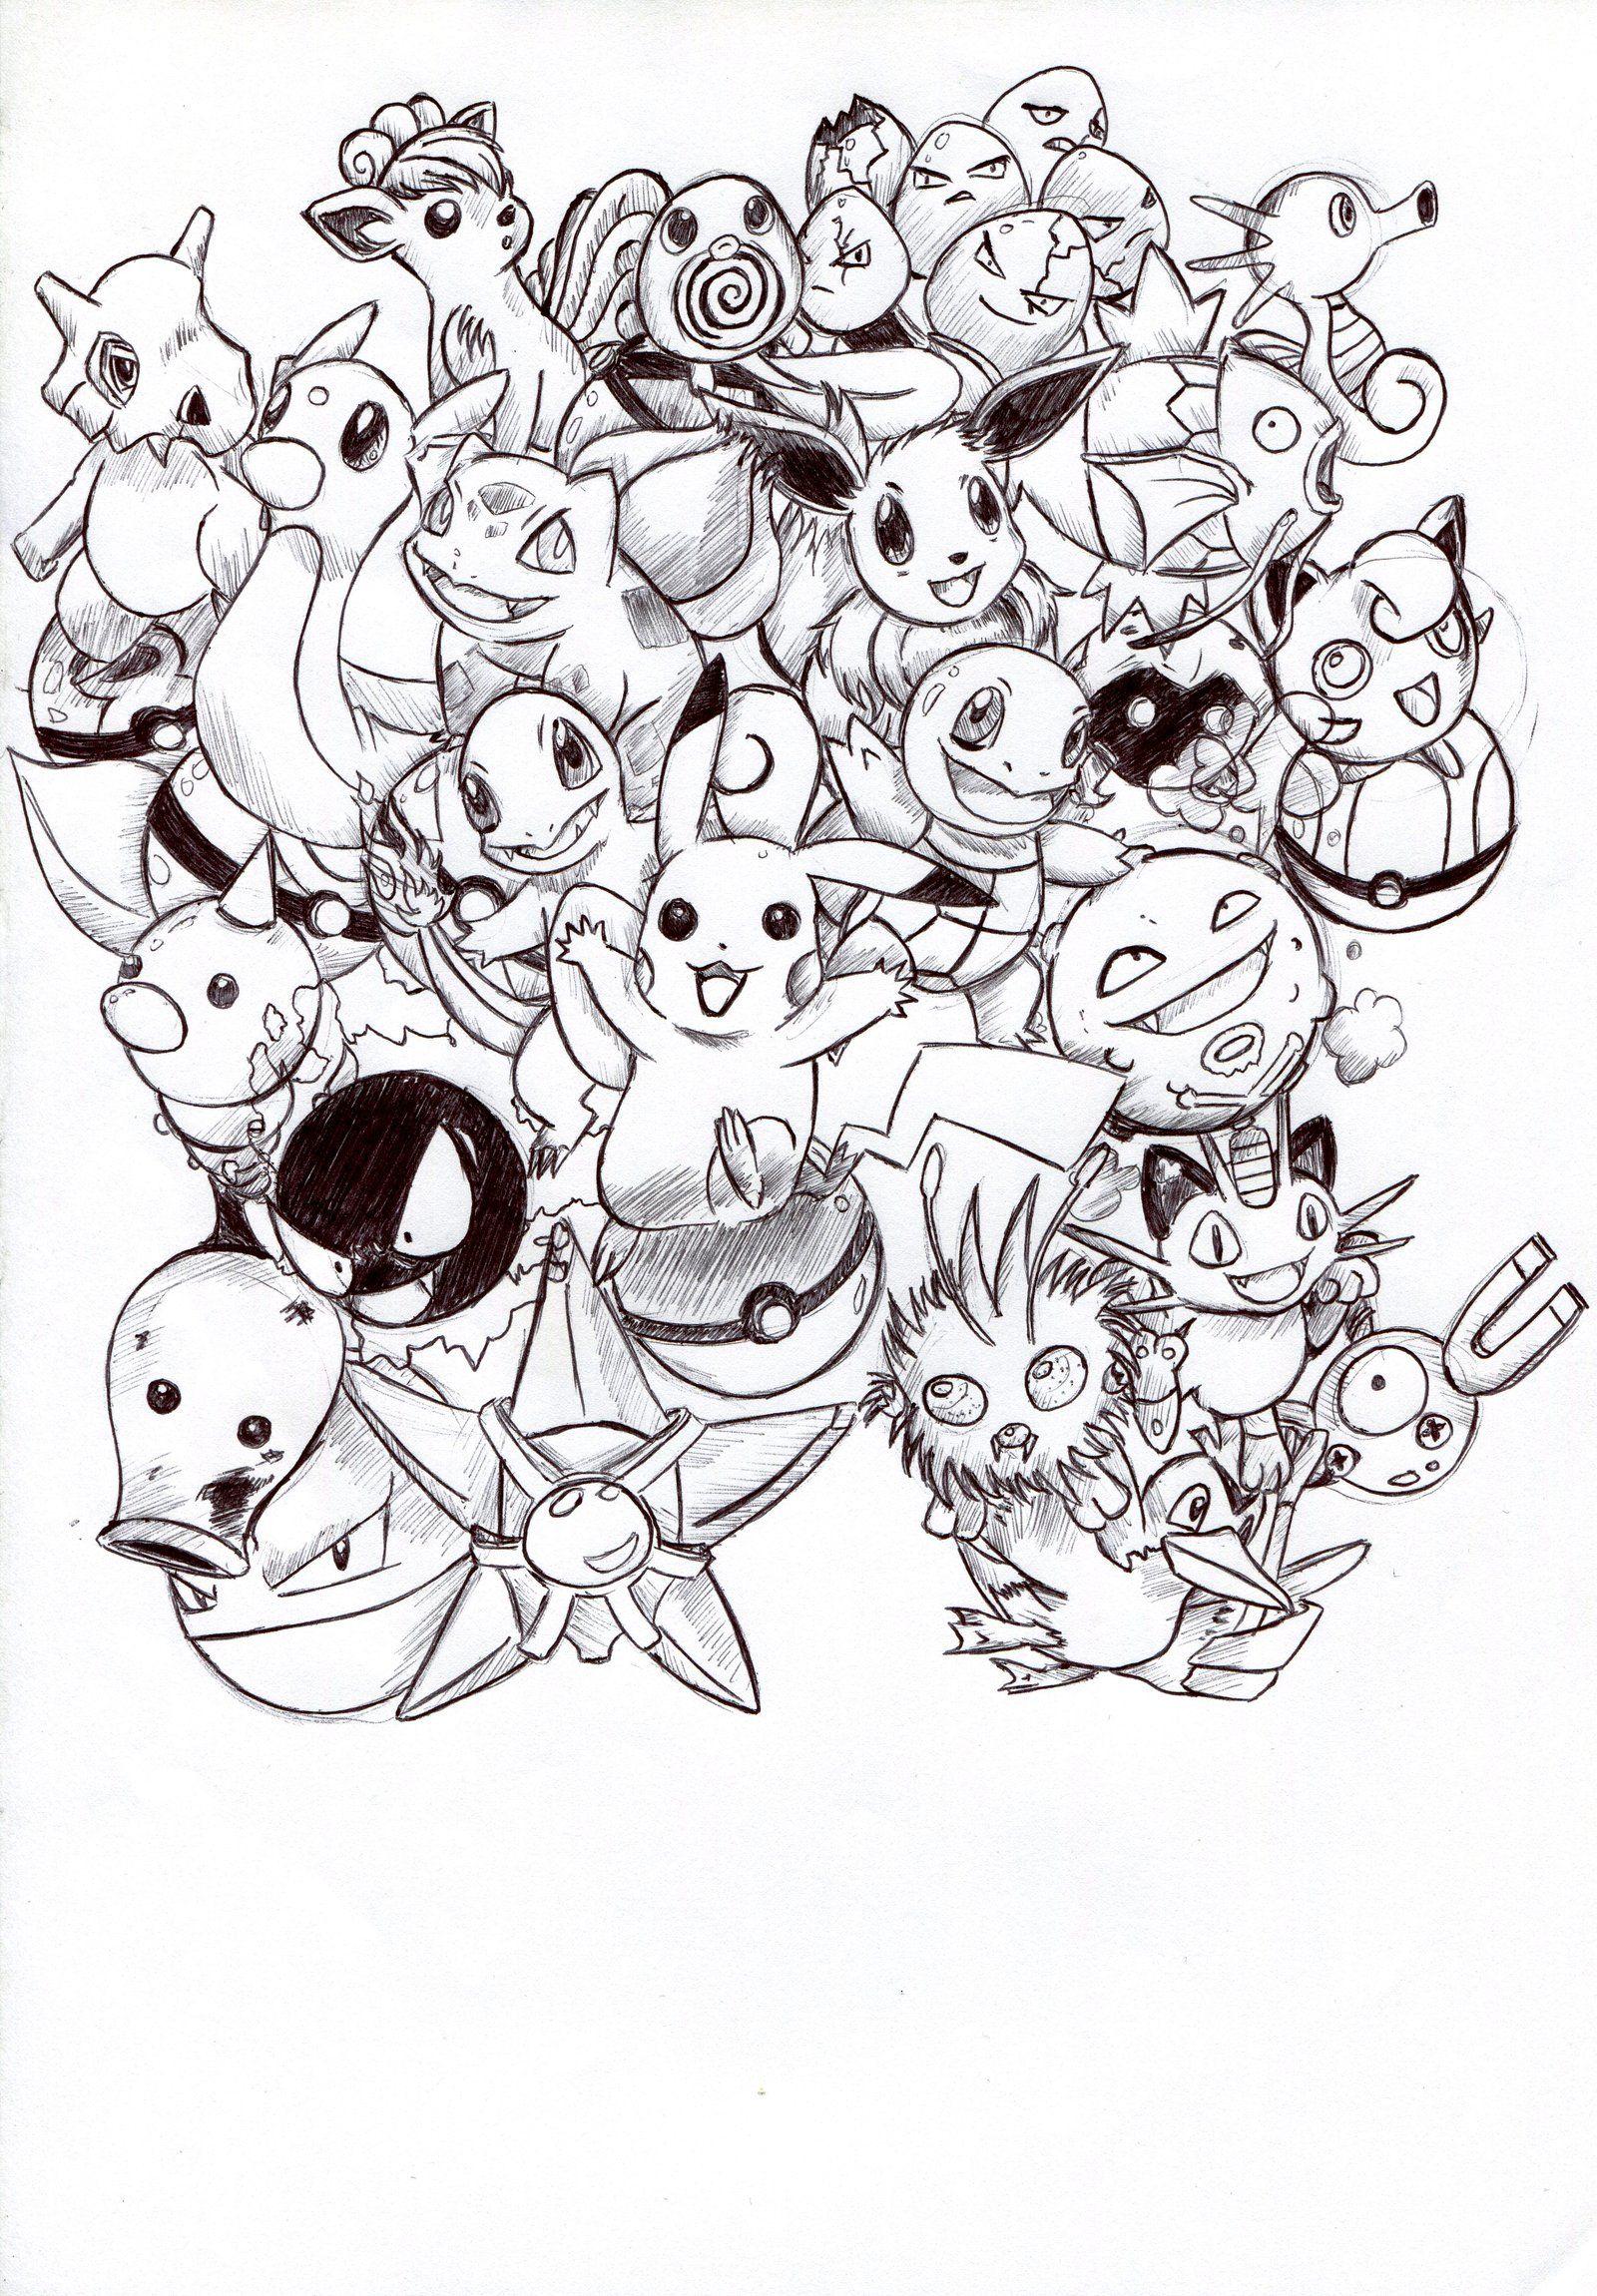 Kanto Pokemon Explosion B W By Troisnyxetienne On Deviantart Pikachu Coloring Page Pokemon Coloring Pokemon Coloring Pages